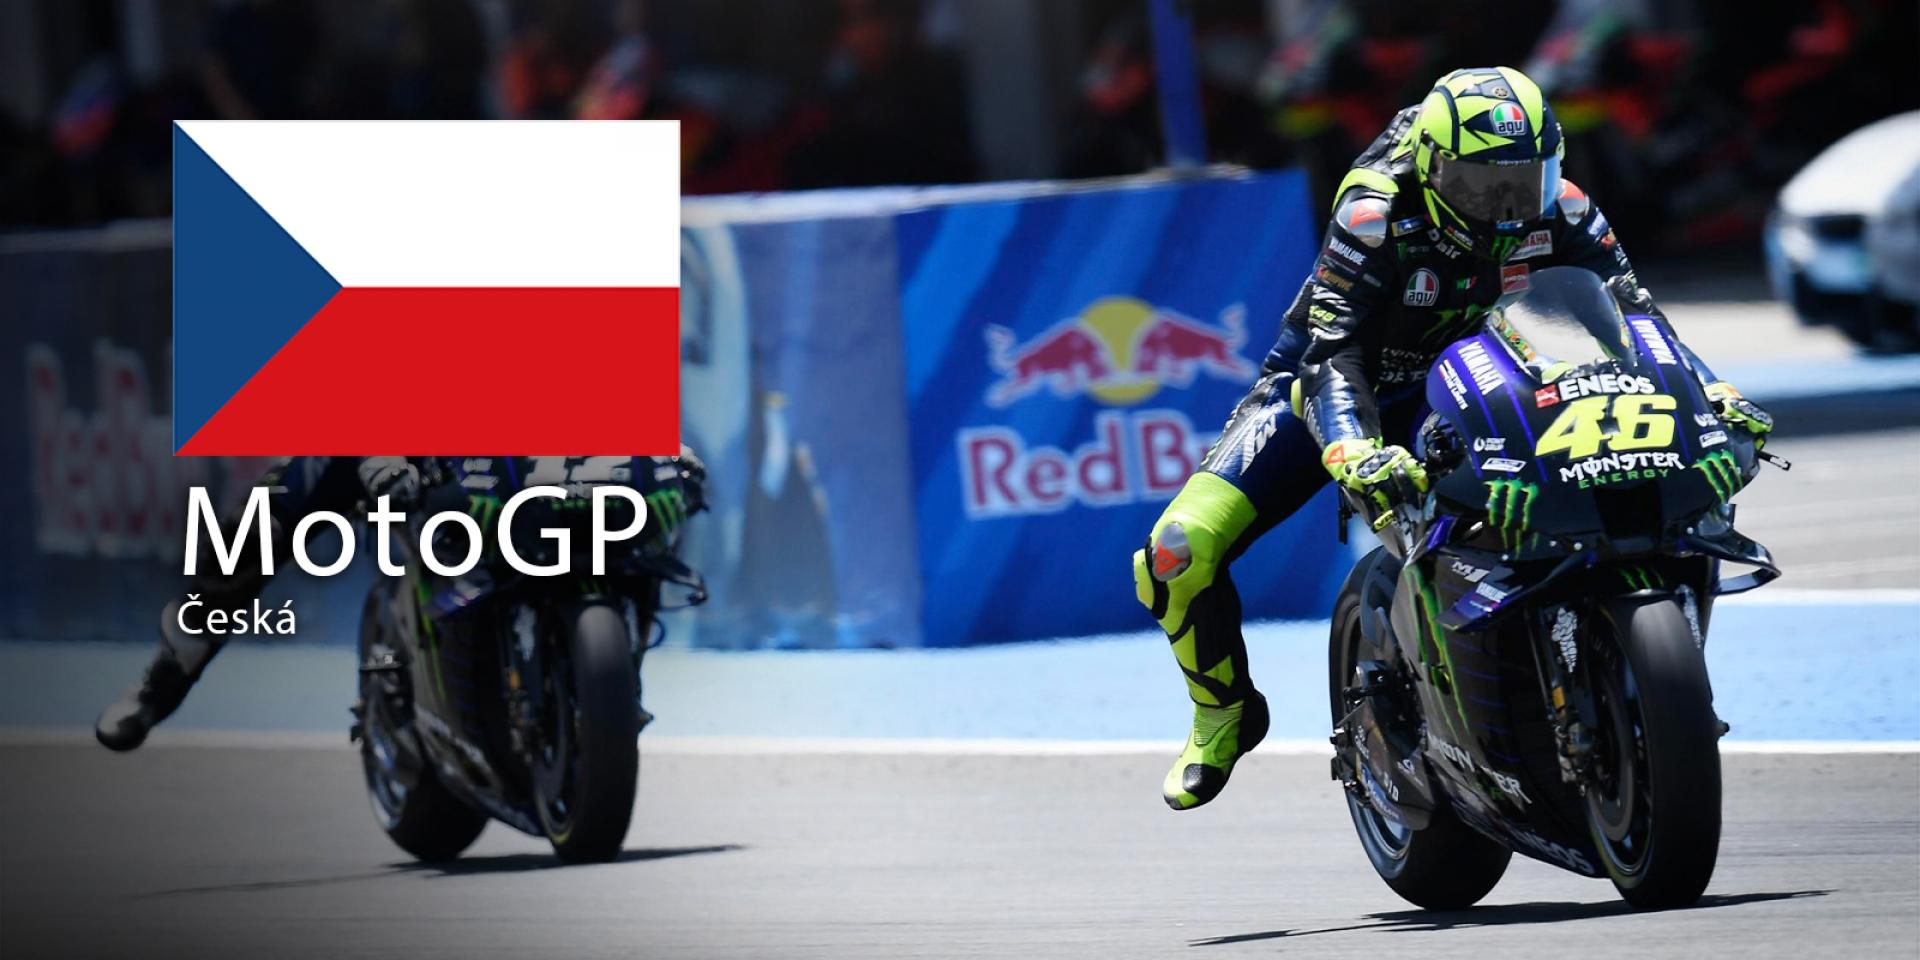 MotoGP 2020 捷克站 轉播時間